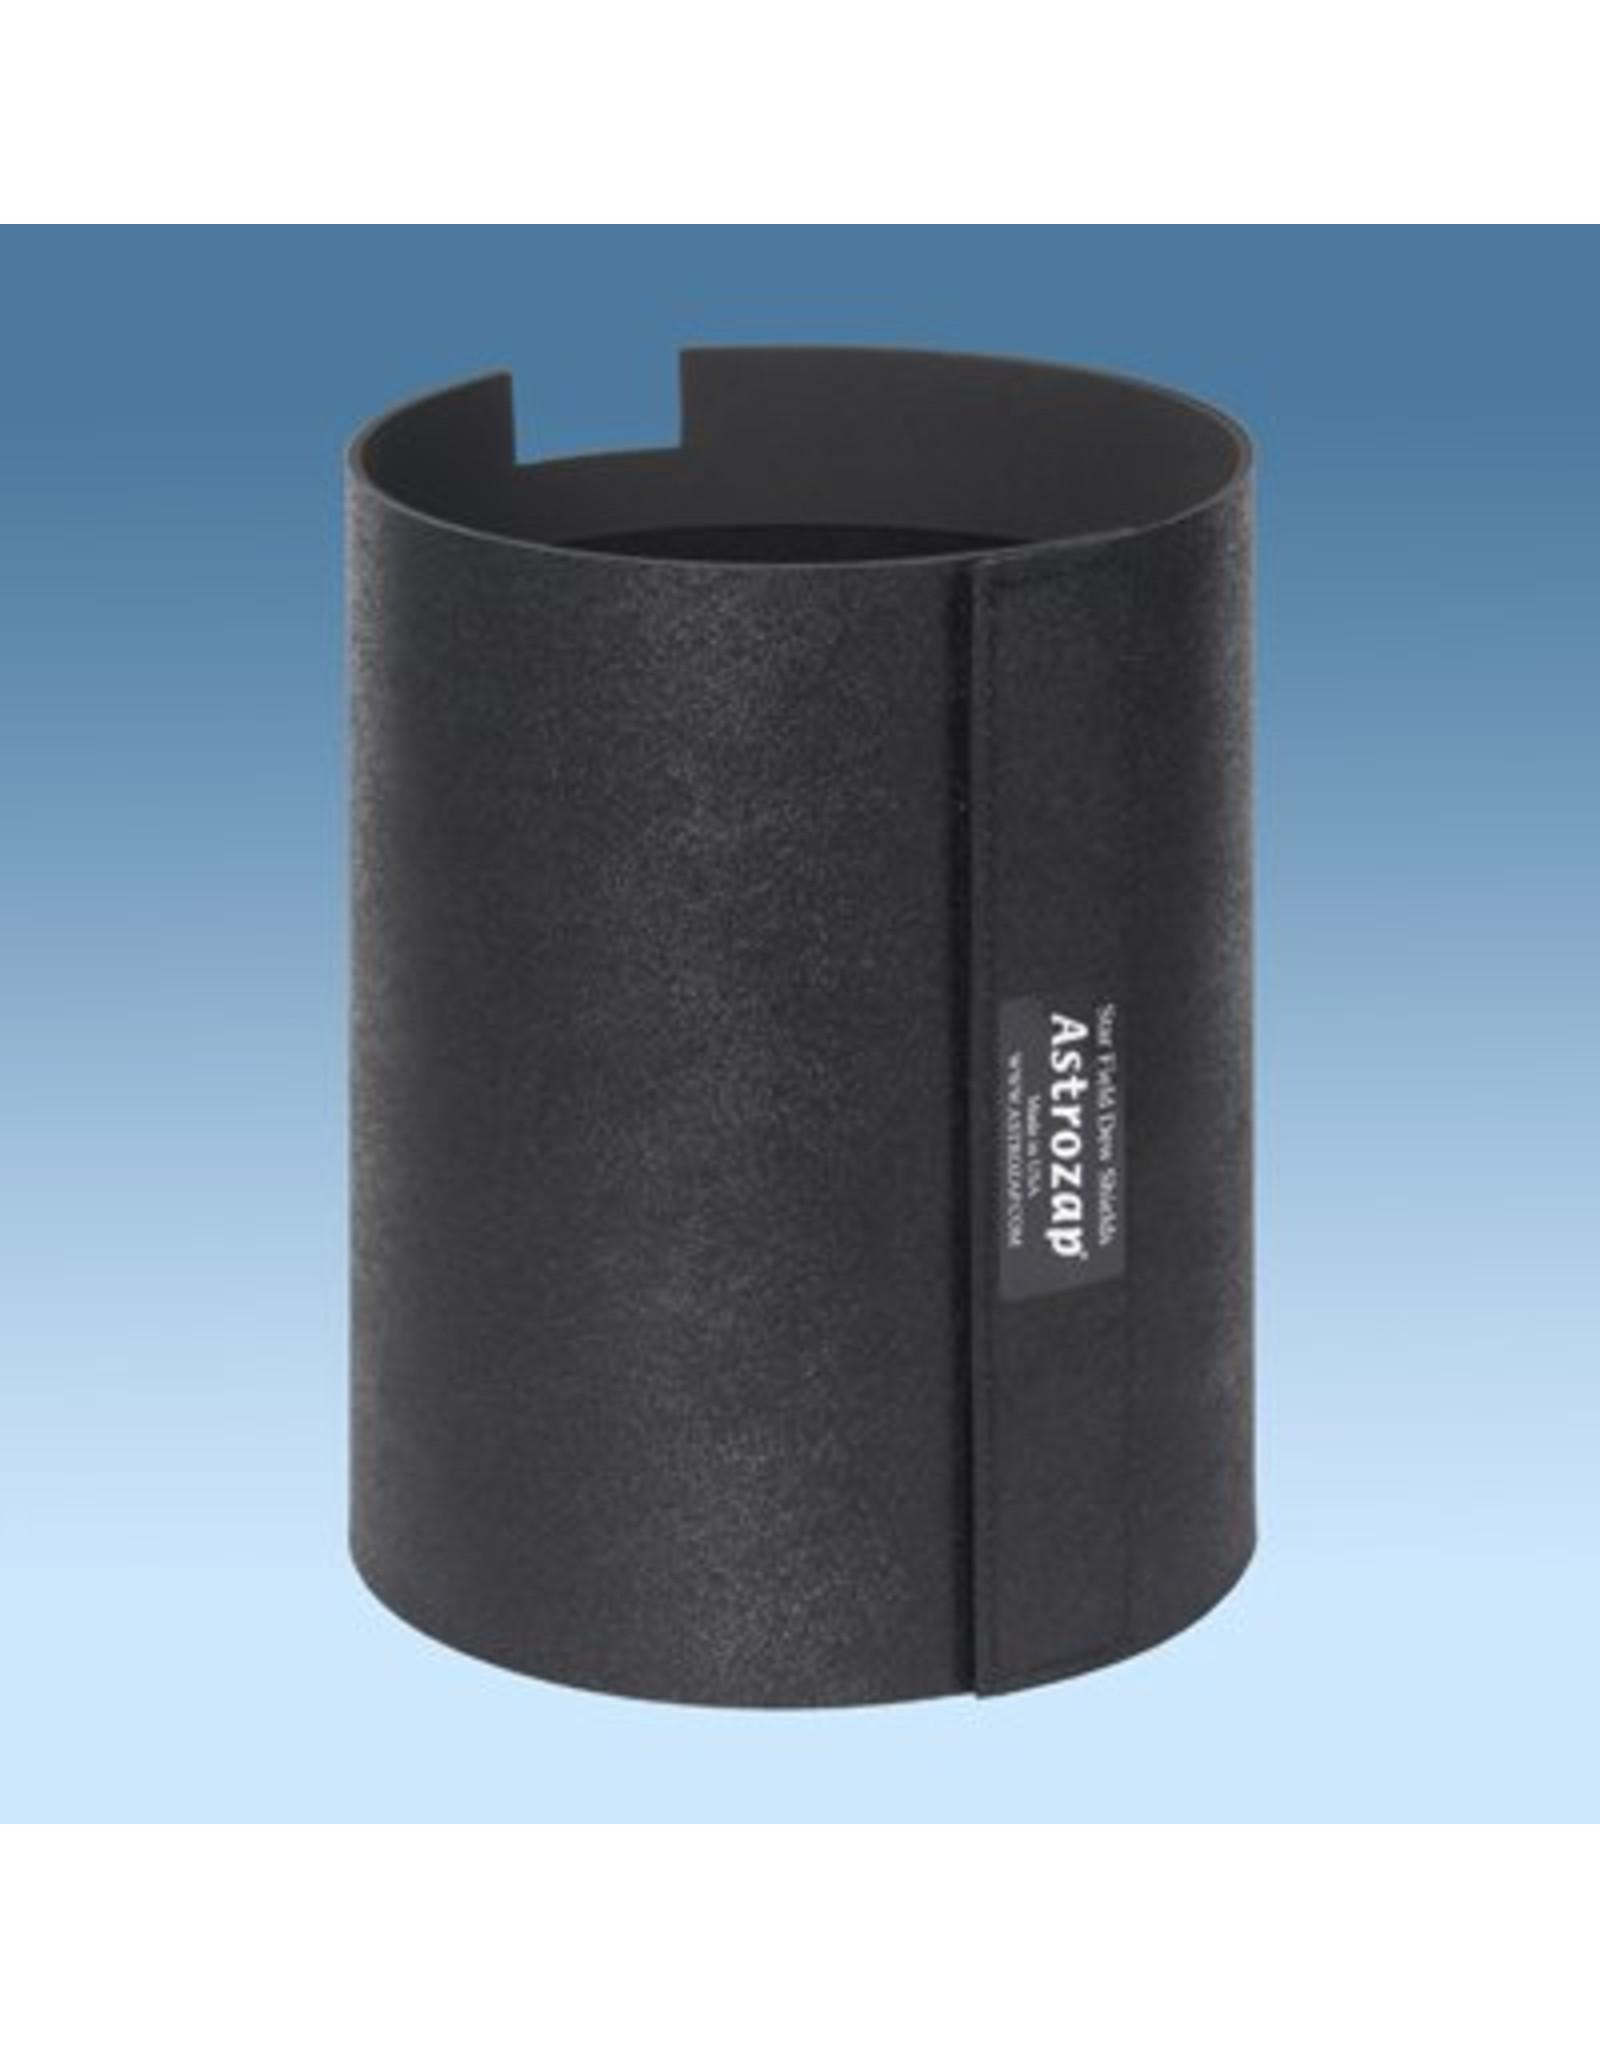 Astrozap Celestron 7 MAK and 8 SCT/CPC Flexi-Shield™ Flexible Dew Shield - No Notch